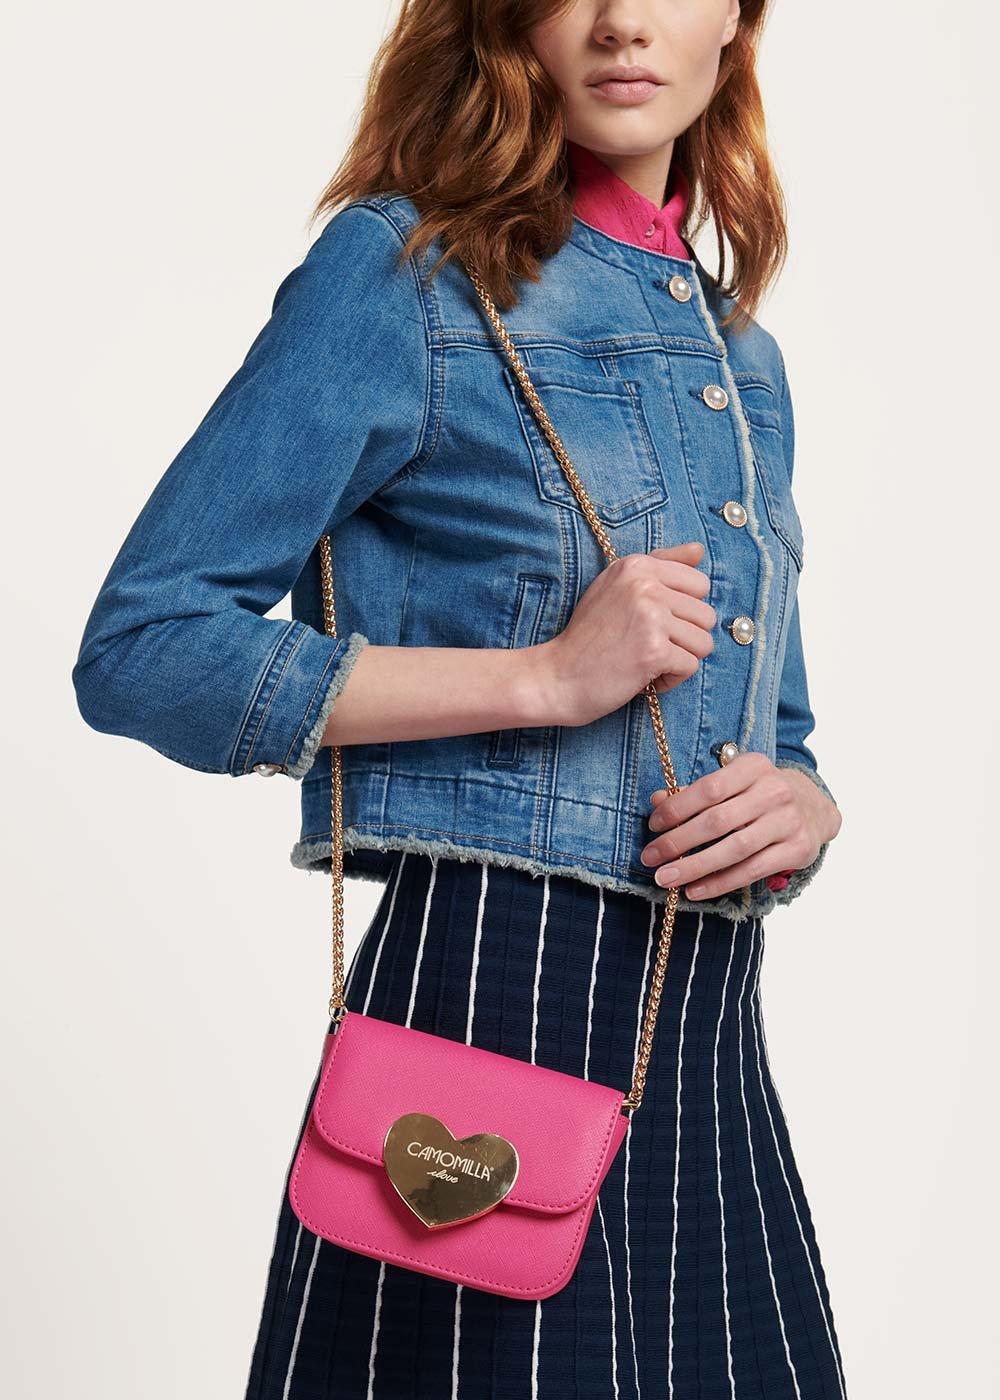 Bonny clutch bag with shoulder strap - Gloss - Woman